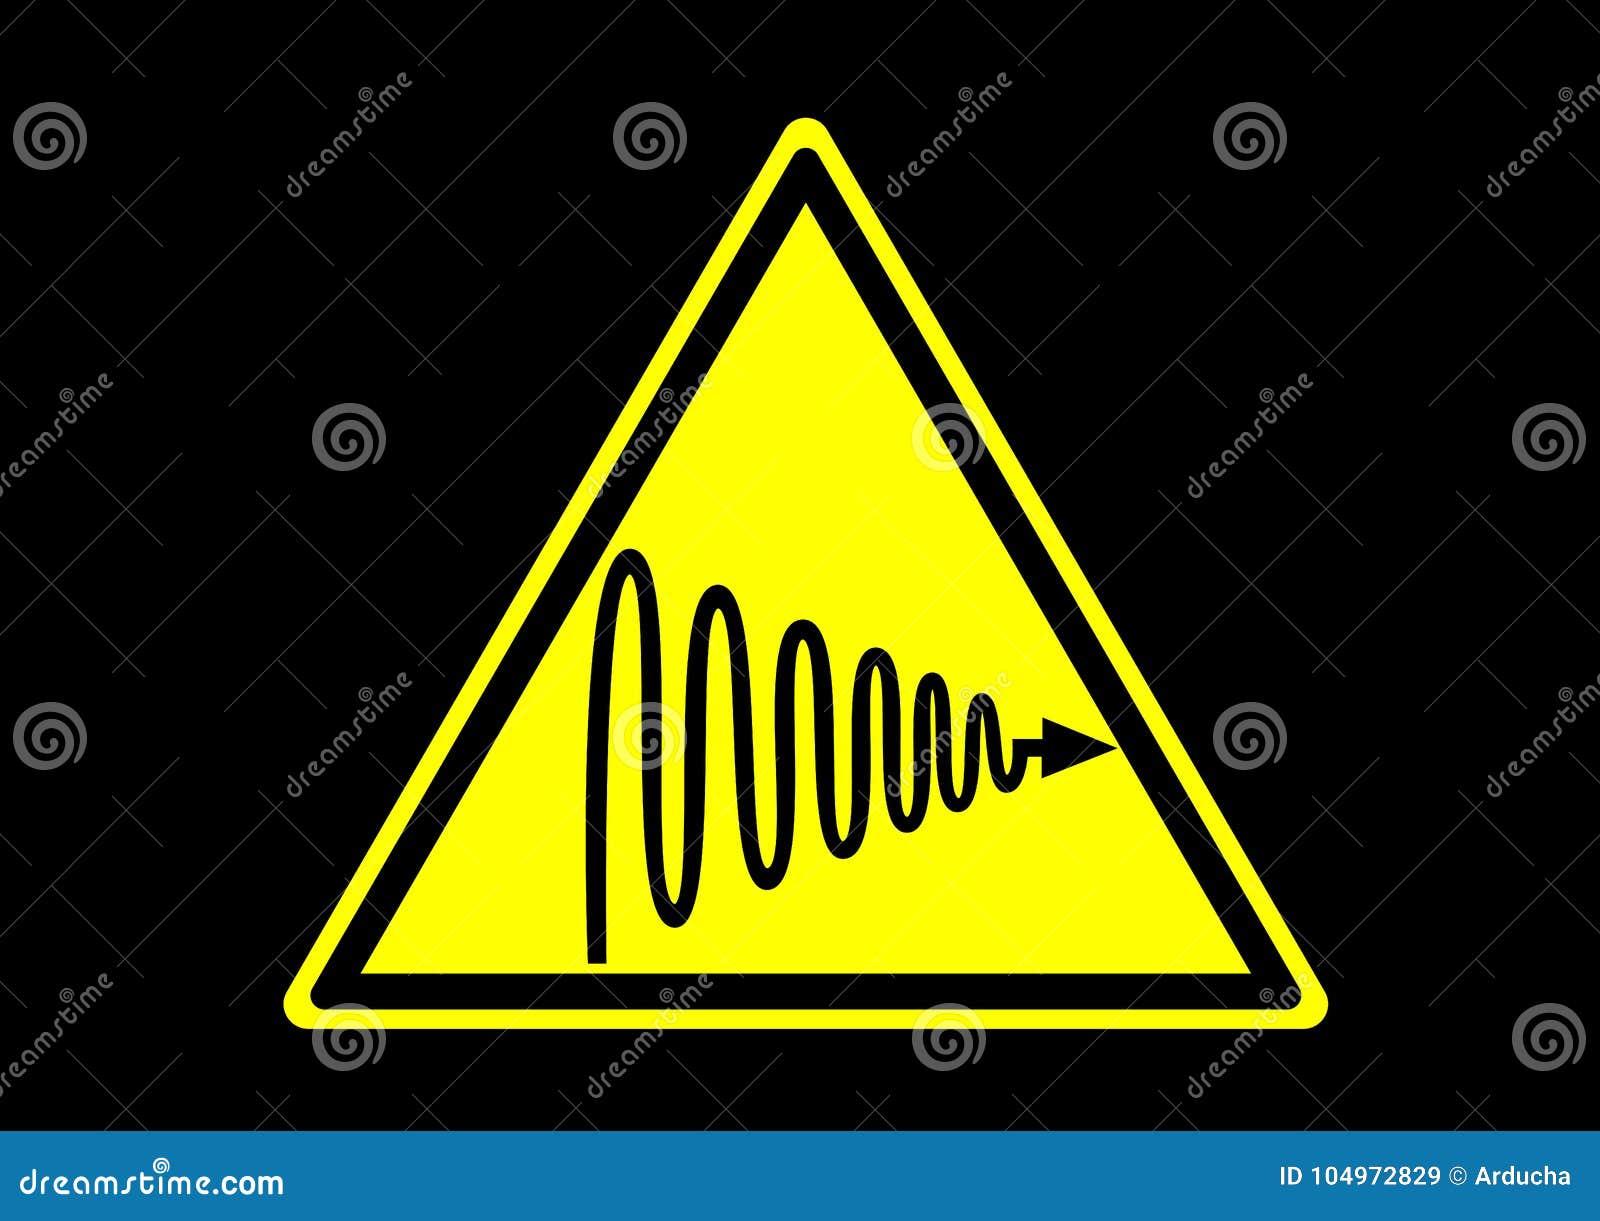 Ultraviolet Light Warning Area Signs Label For Emergency